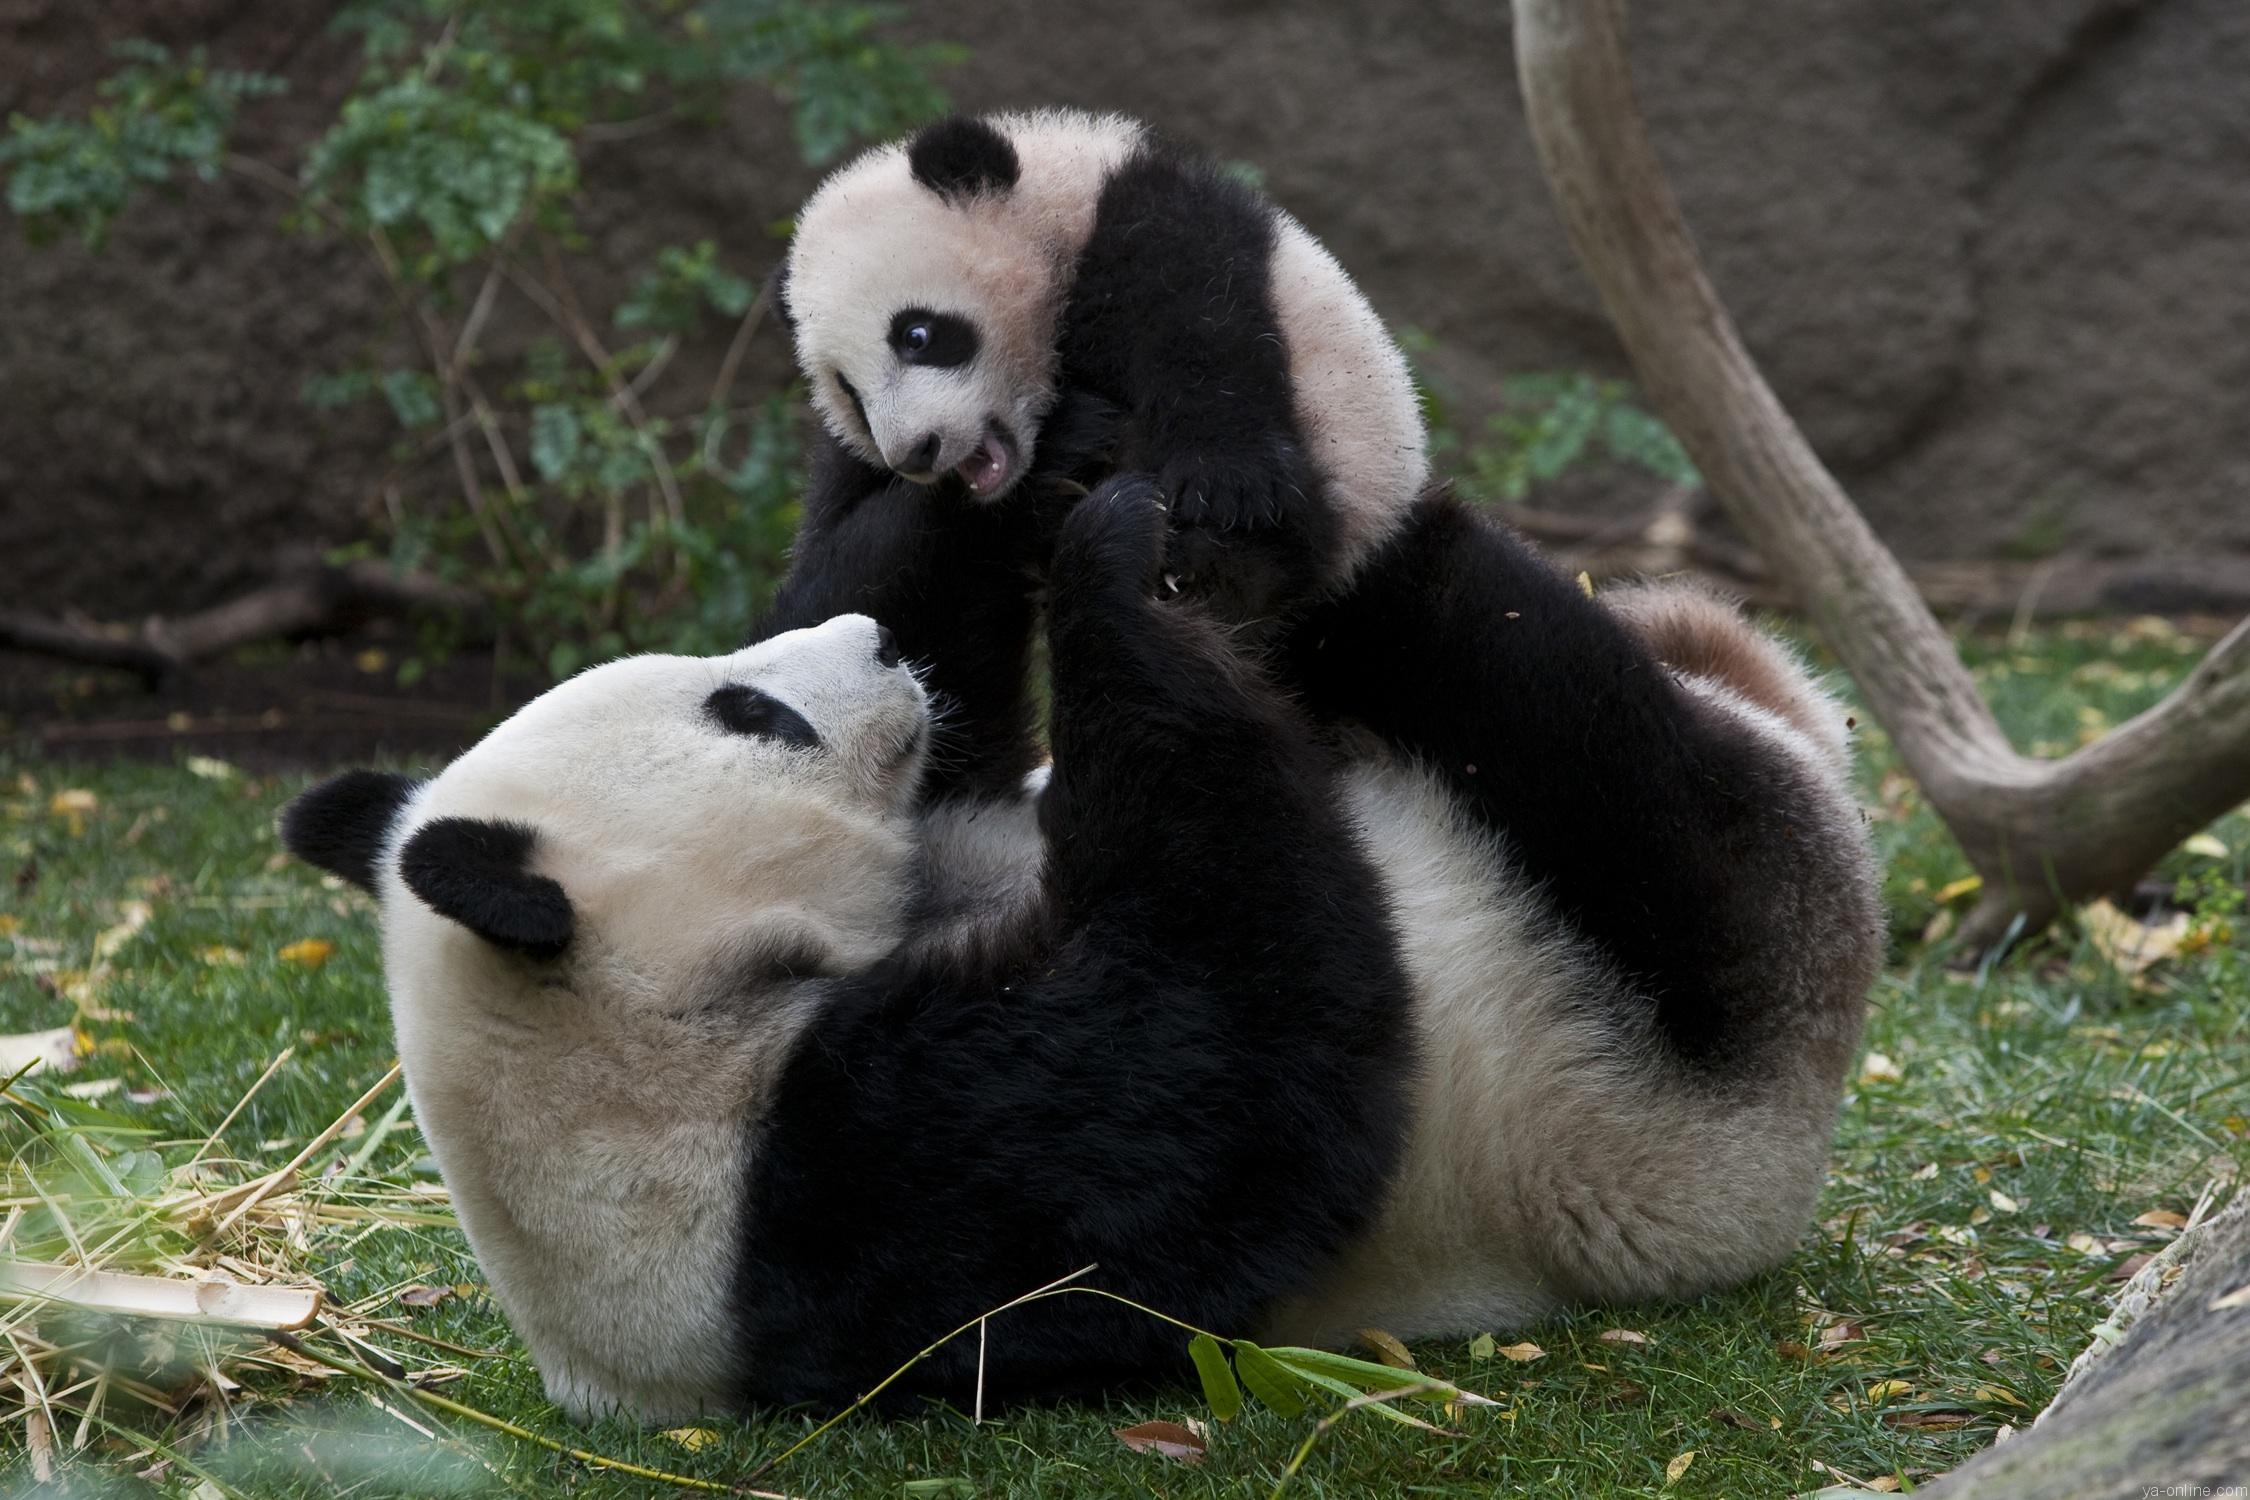 Giant panda mother and cub, Bai Yun and Yun Zi